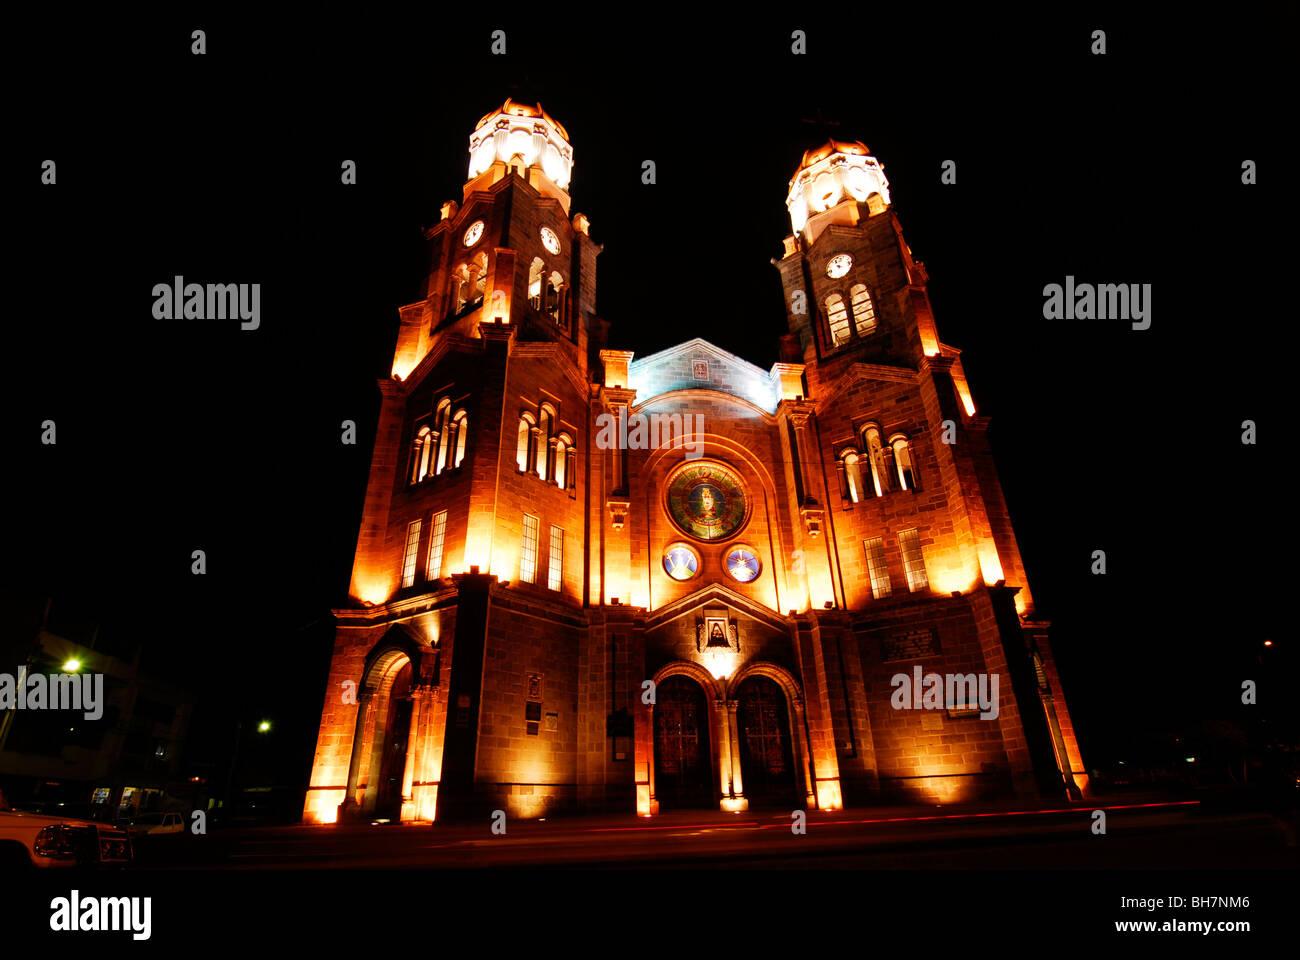 Ecuador, Ibarra, low angle view of the Ibarra brightly illuminated catholic church at night - Stock Image